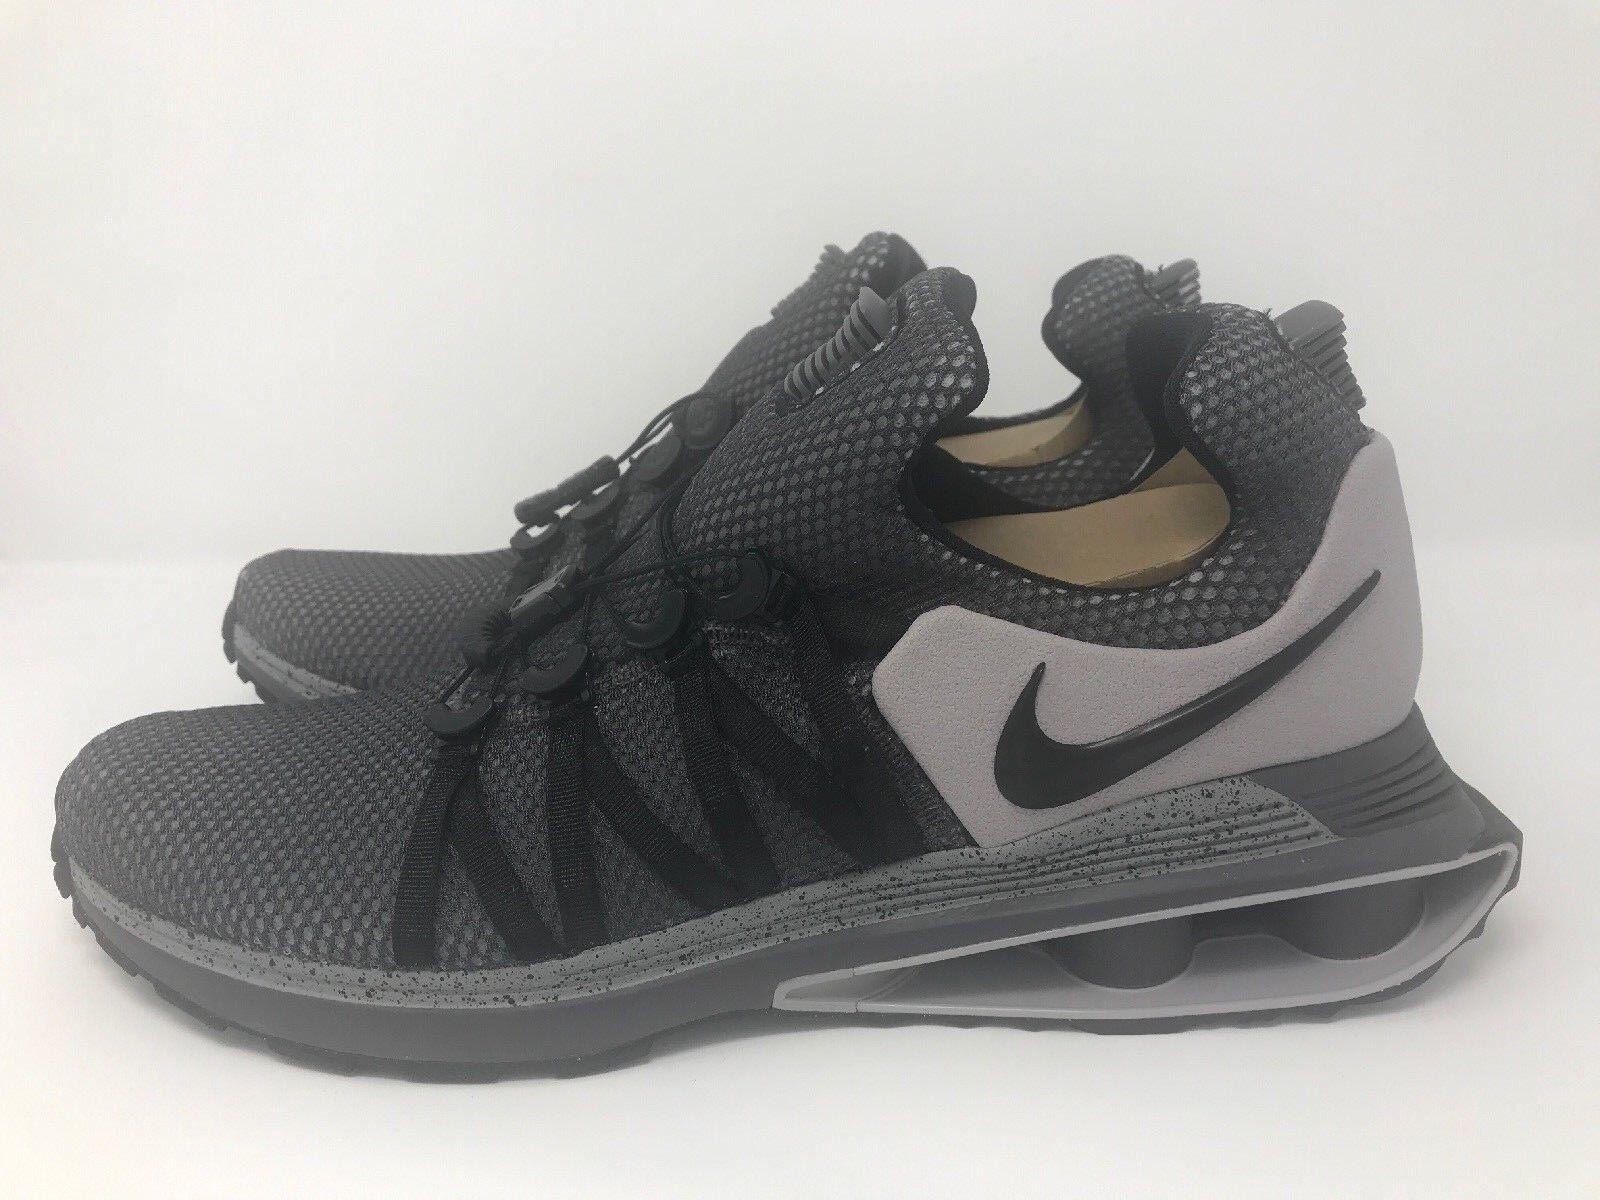 1e79761e48bd ... low price 150 nike shoes shox gravity mens shoes nike size 12  atmosphere grey black ar1999